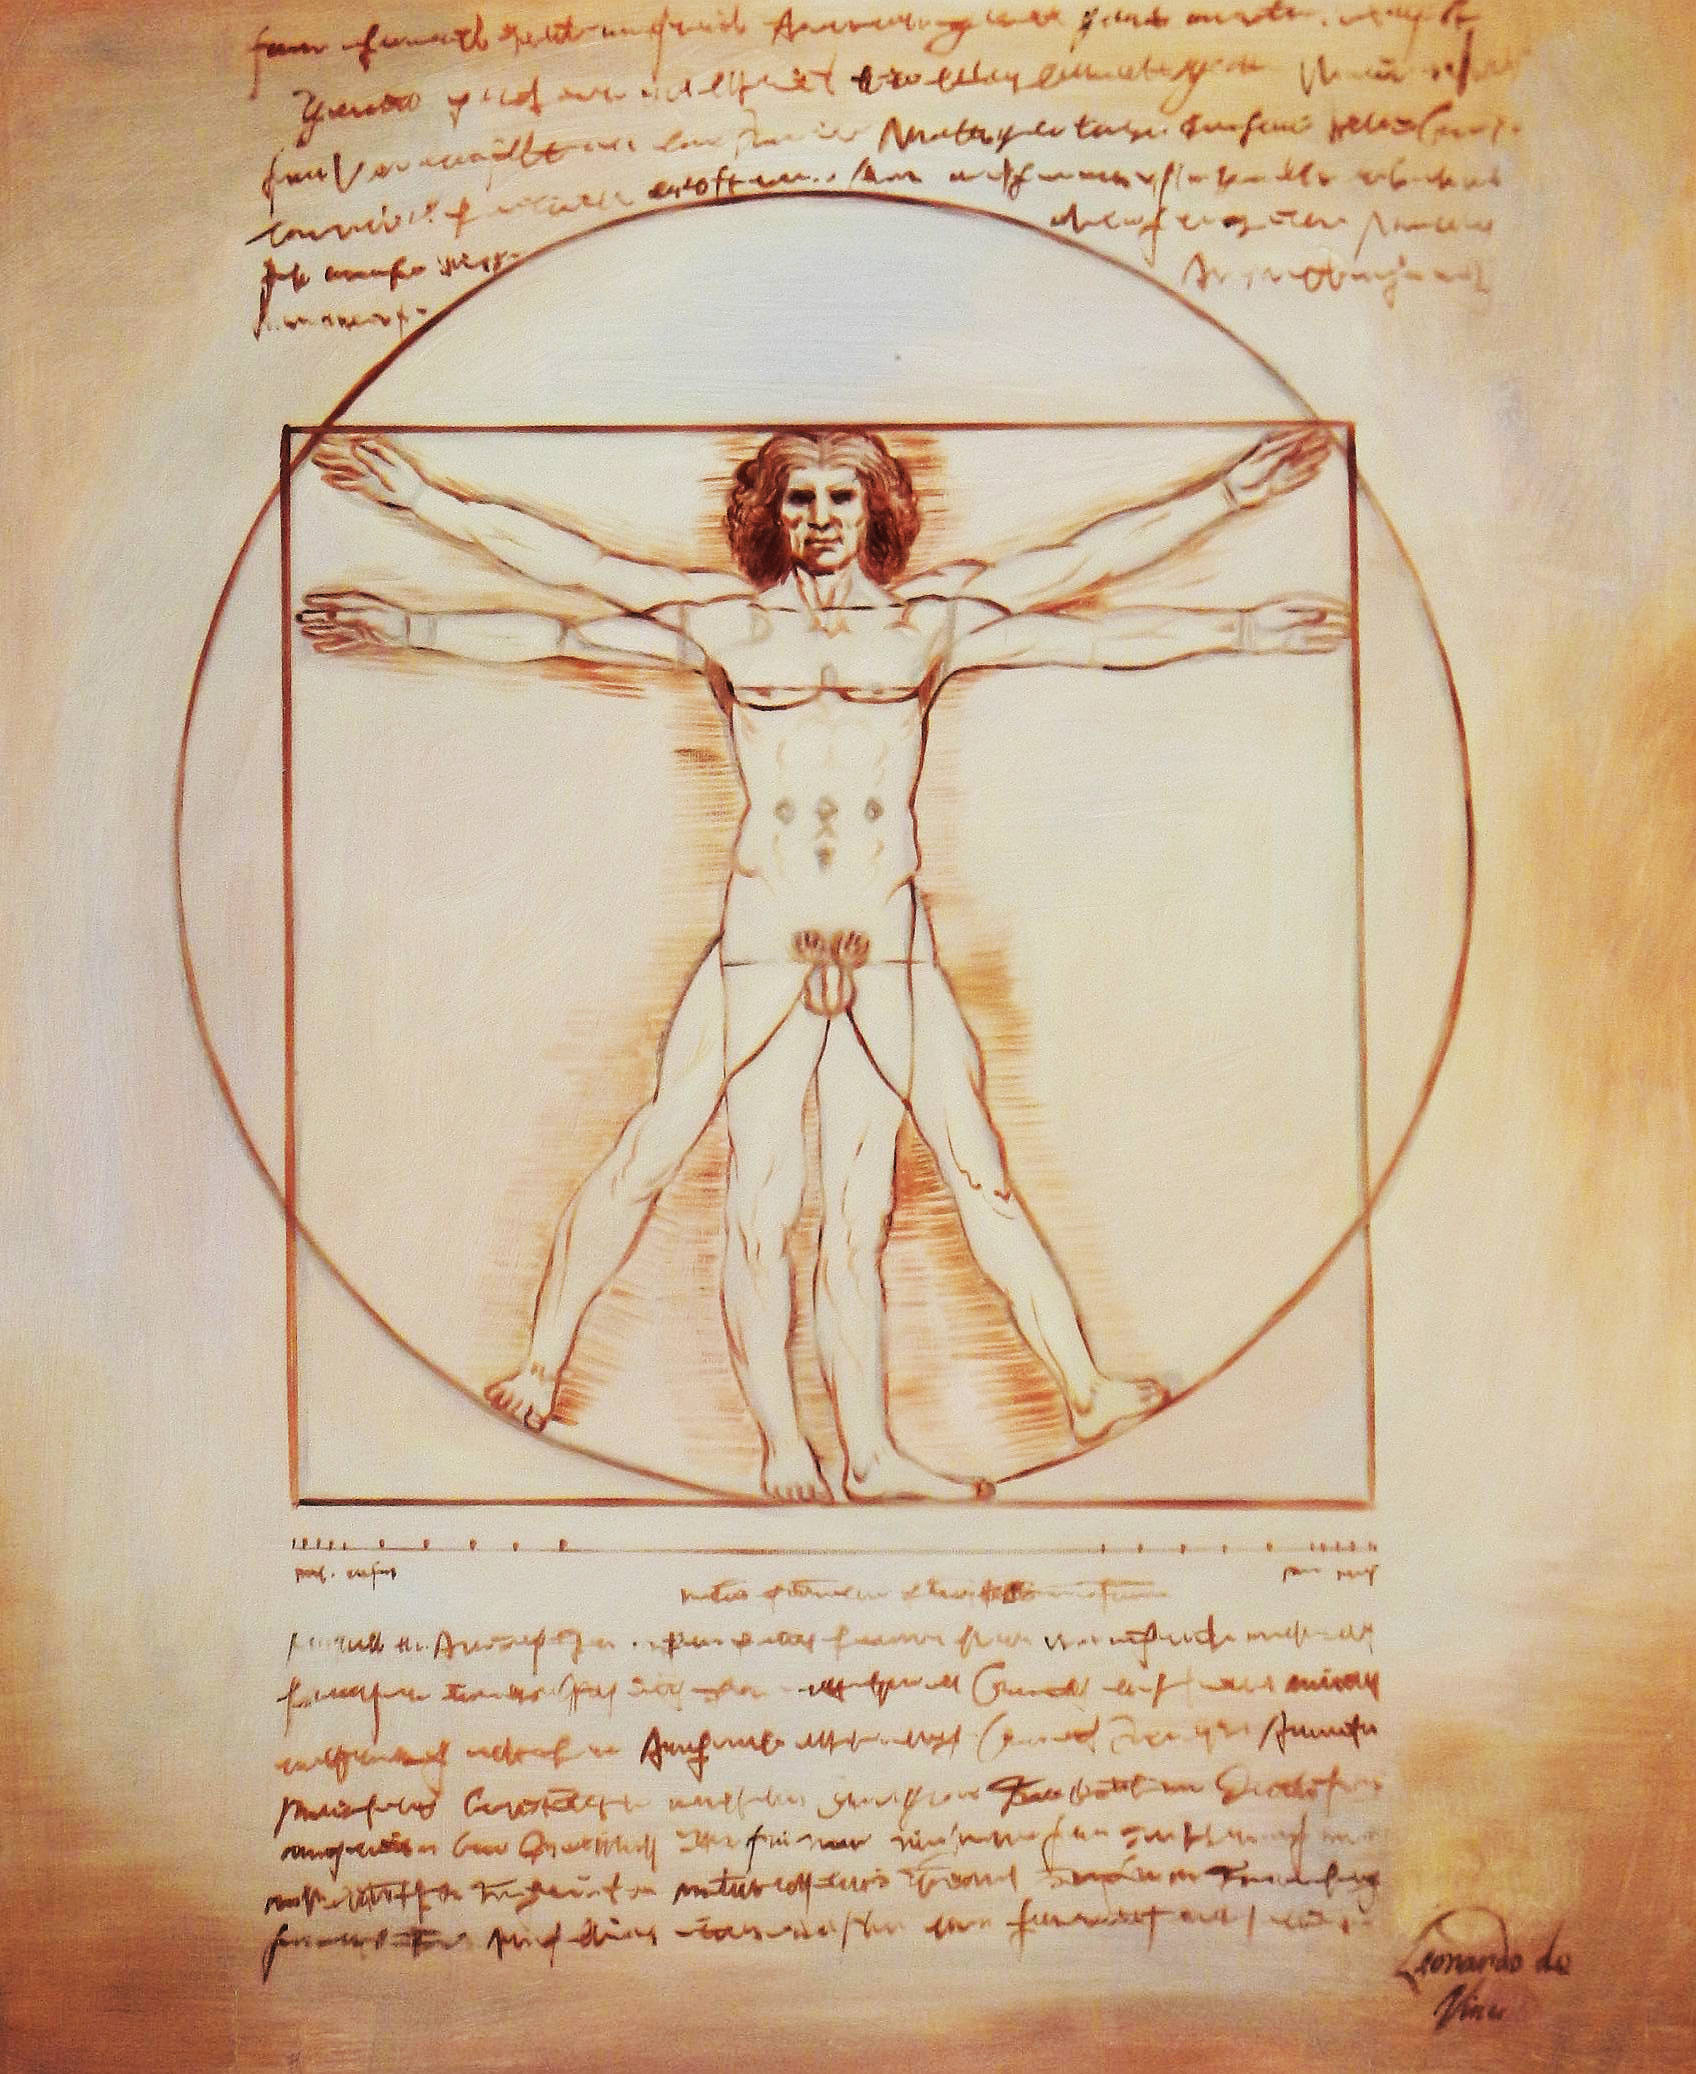 Leonardo da Vinci - Proportionsstudie c93888 50x60cm handgemaltes Ölgemälde